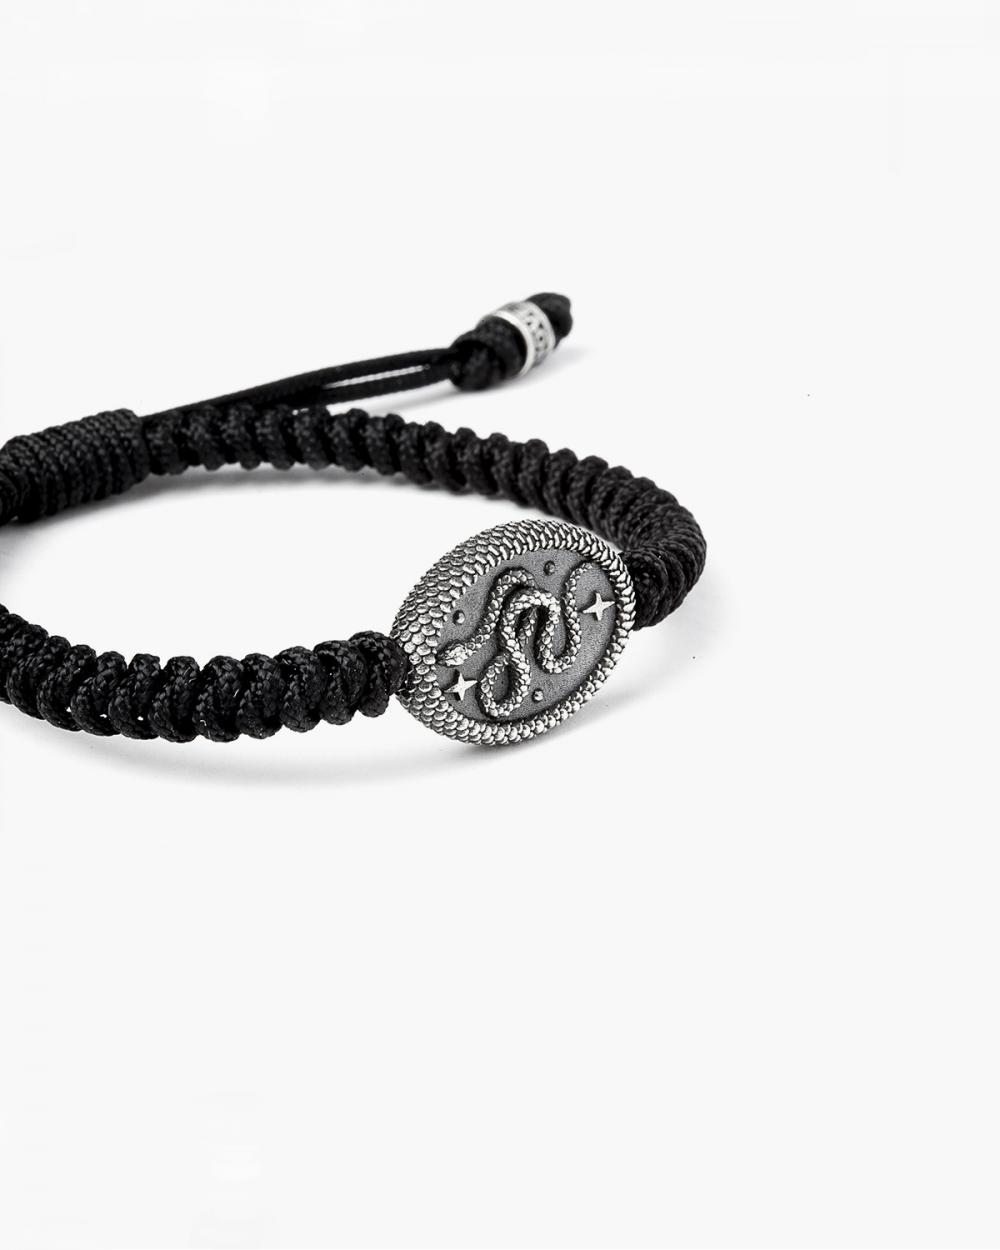 Bracelets SNAKE AND ROPE BRACELET NOVE25